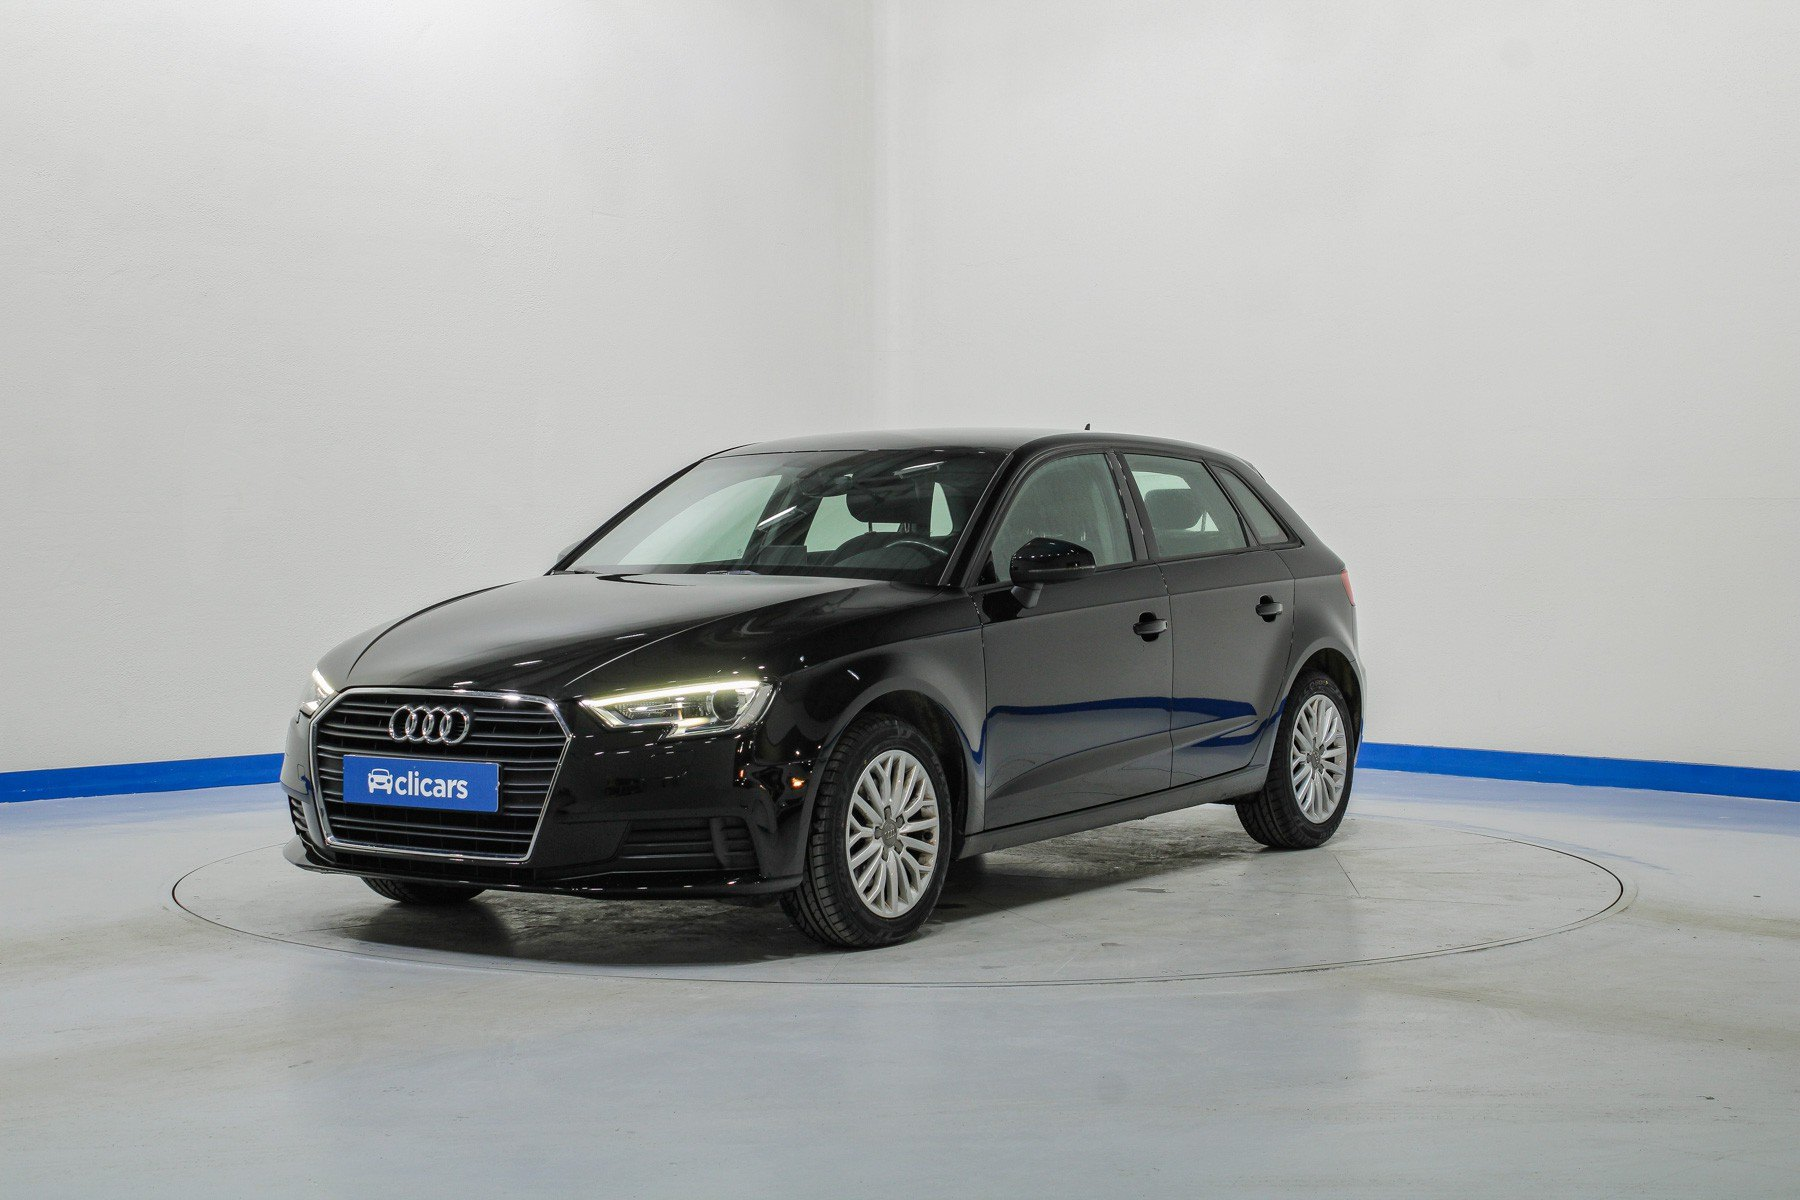 Audi A3 Diésel 2.0 TDI 110kW (150CV) Sportback 1